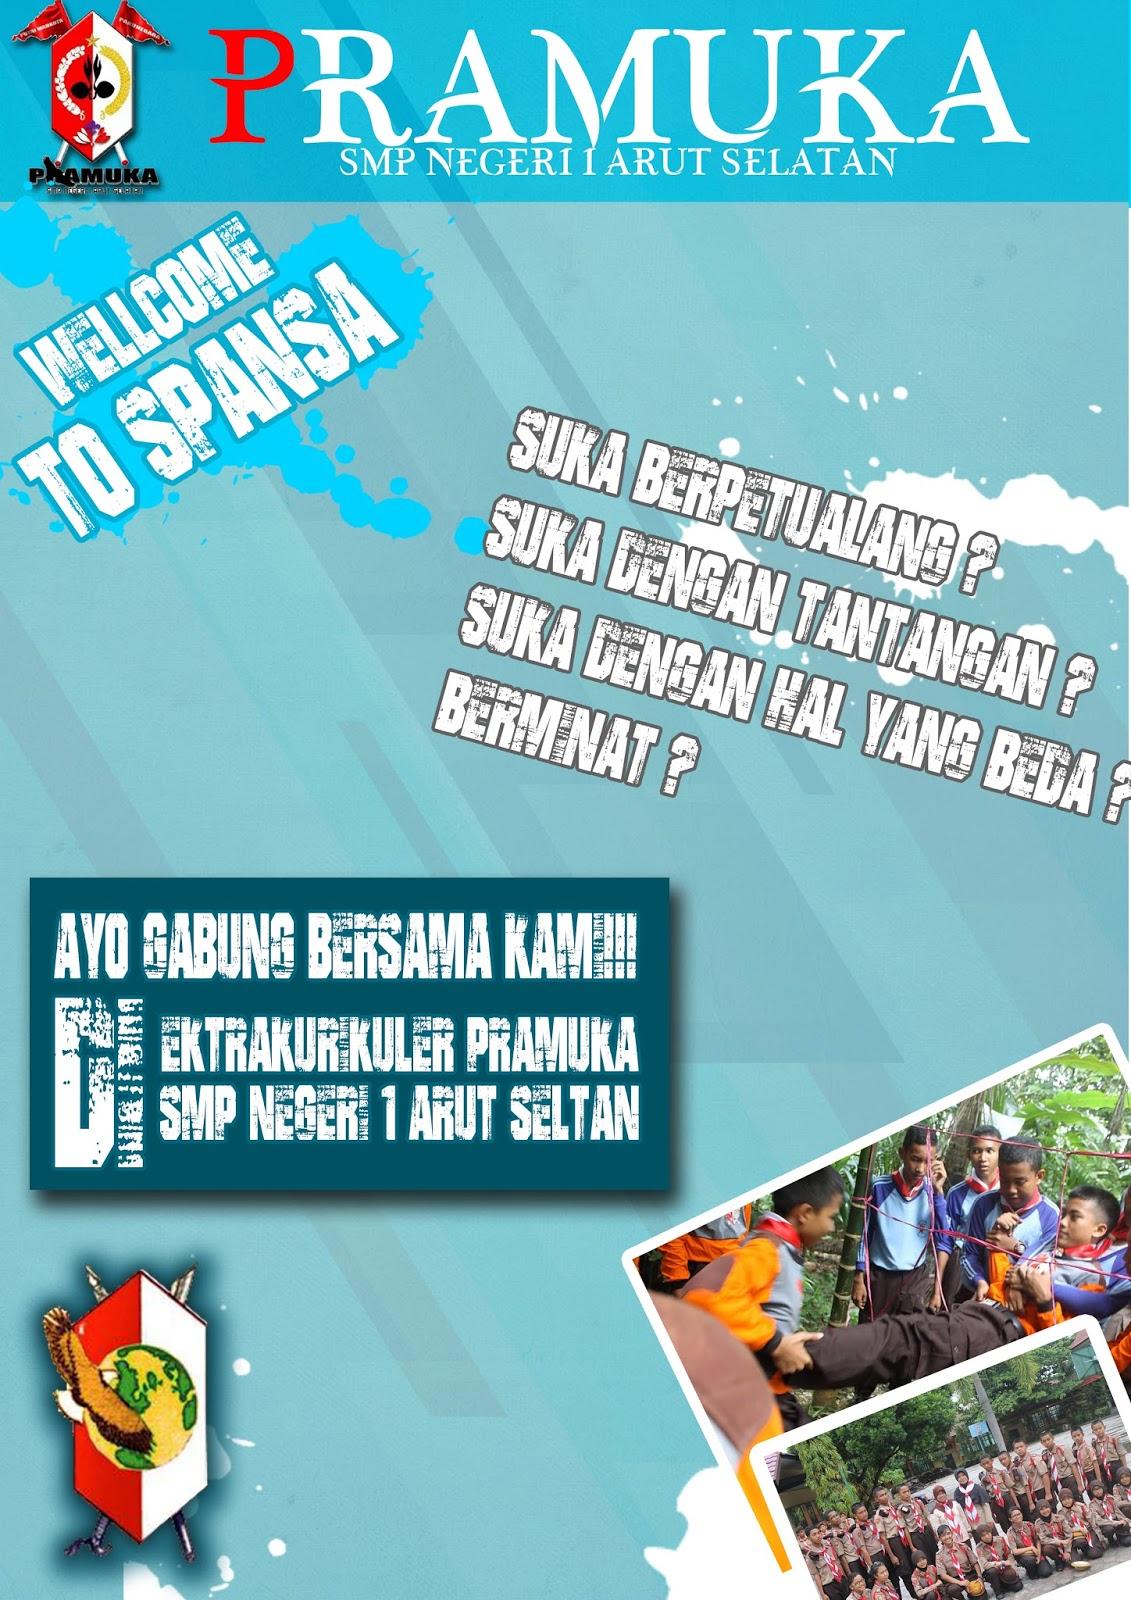 Keren Contoh Poster Open Recruitment Organisasi - Koleksi ...